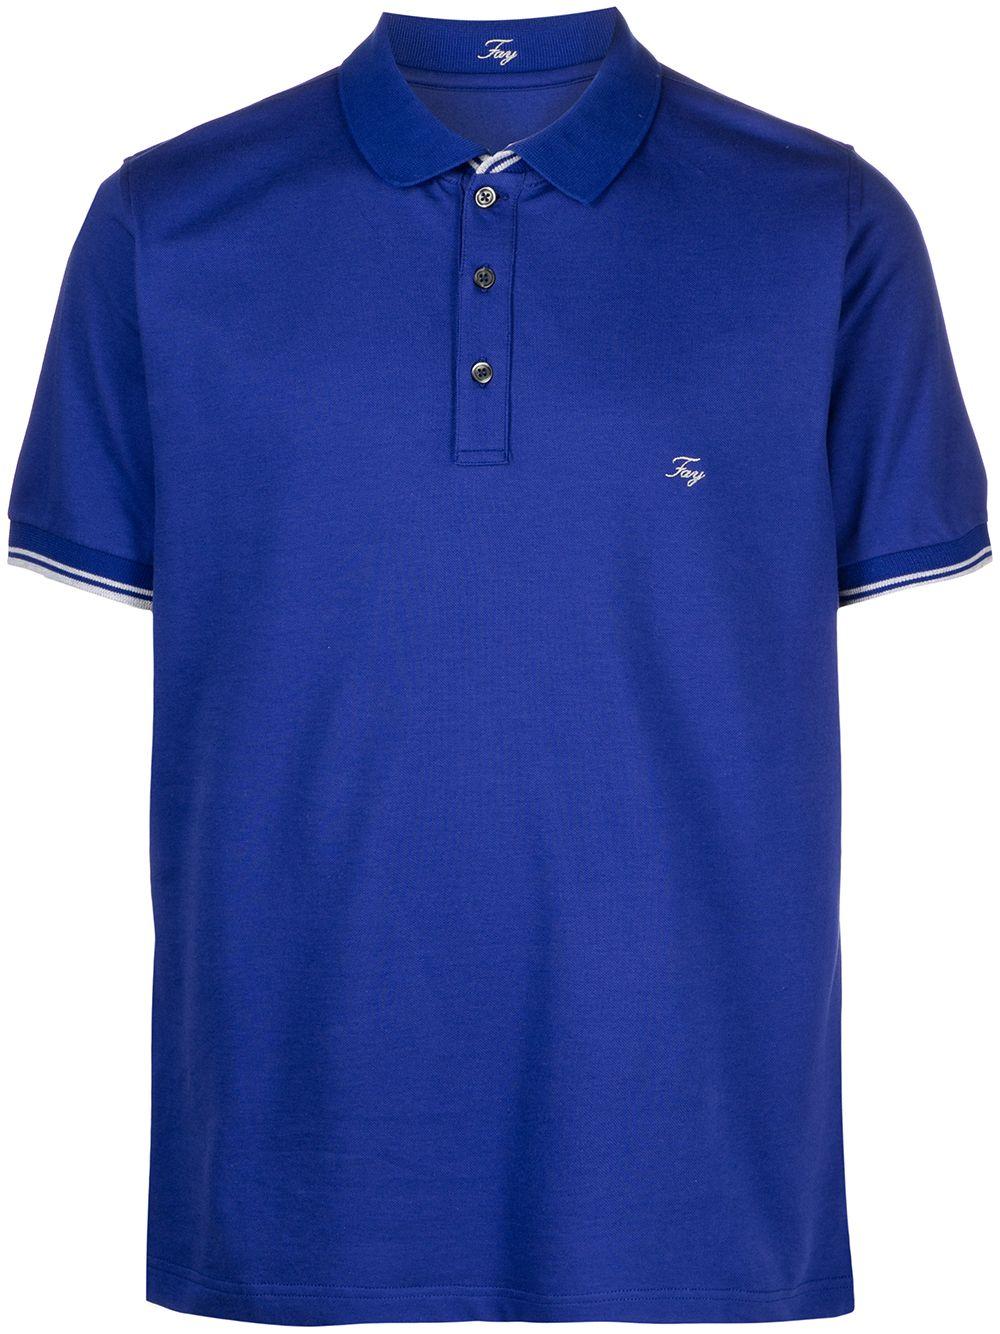 FAY- Cotton Polo- Man- Xxl - Blue